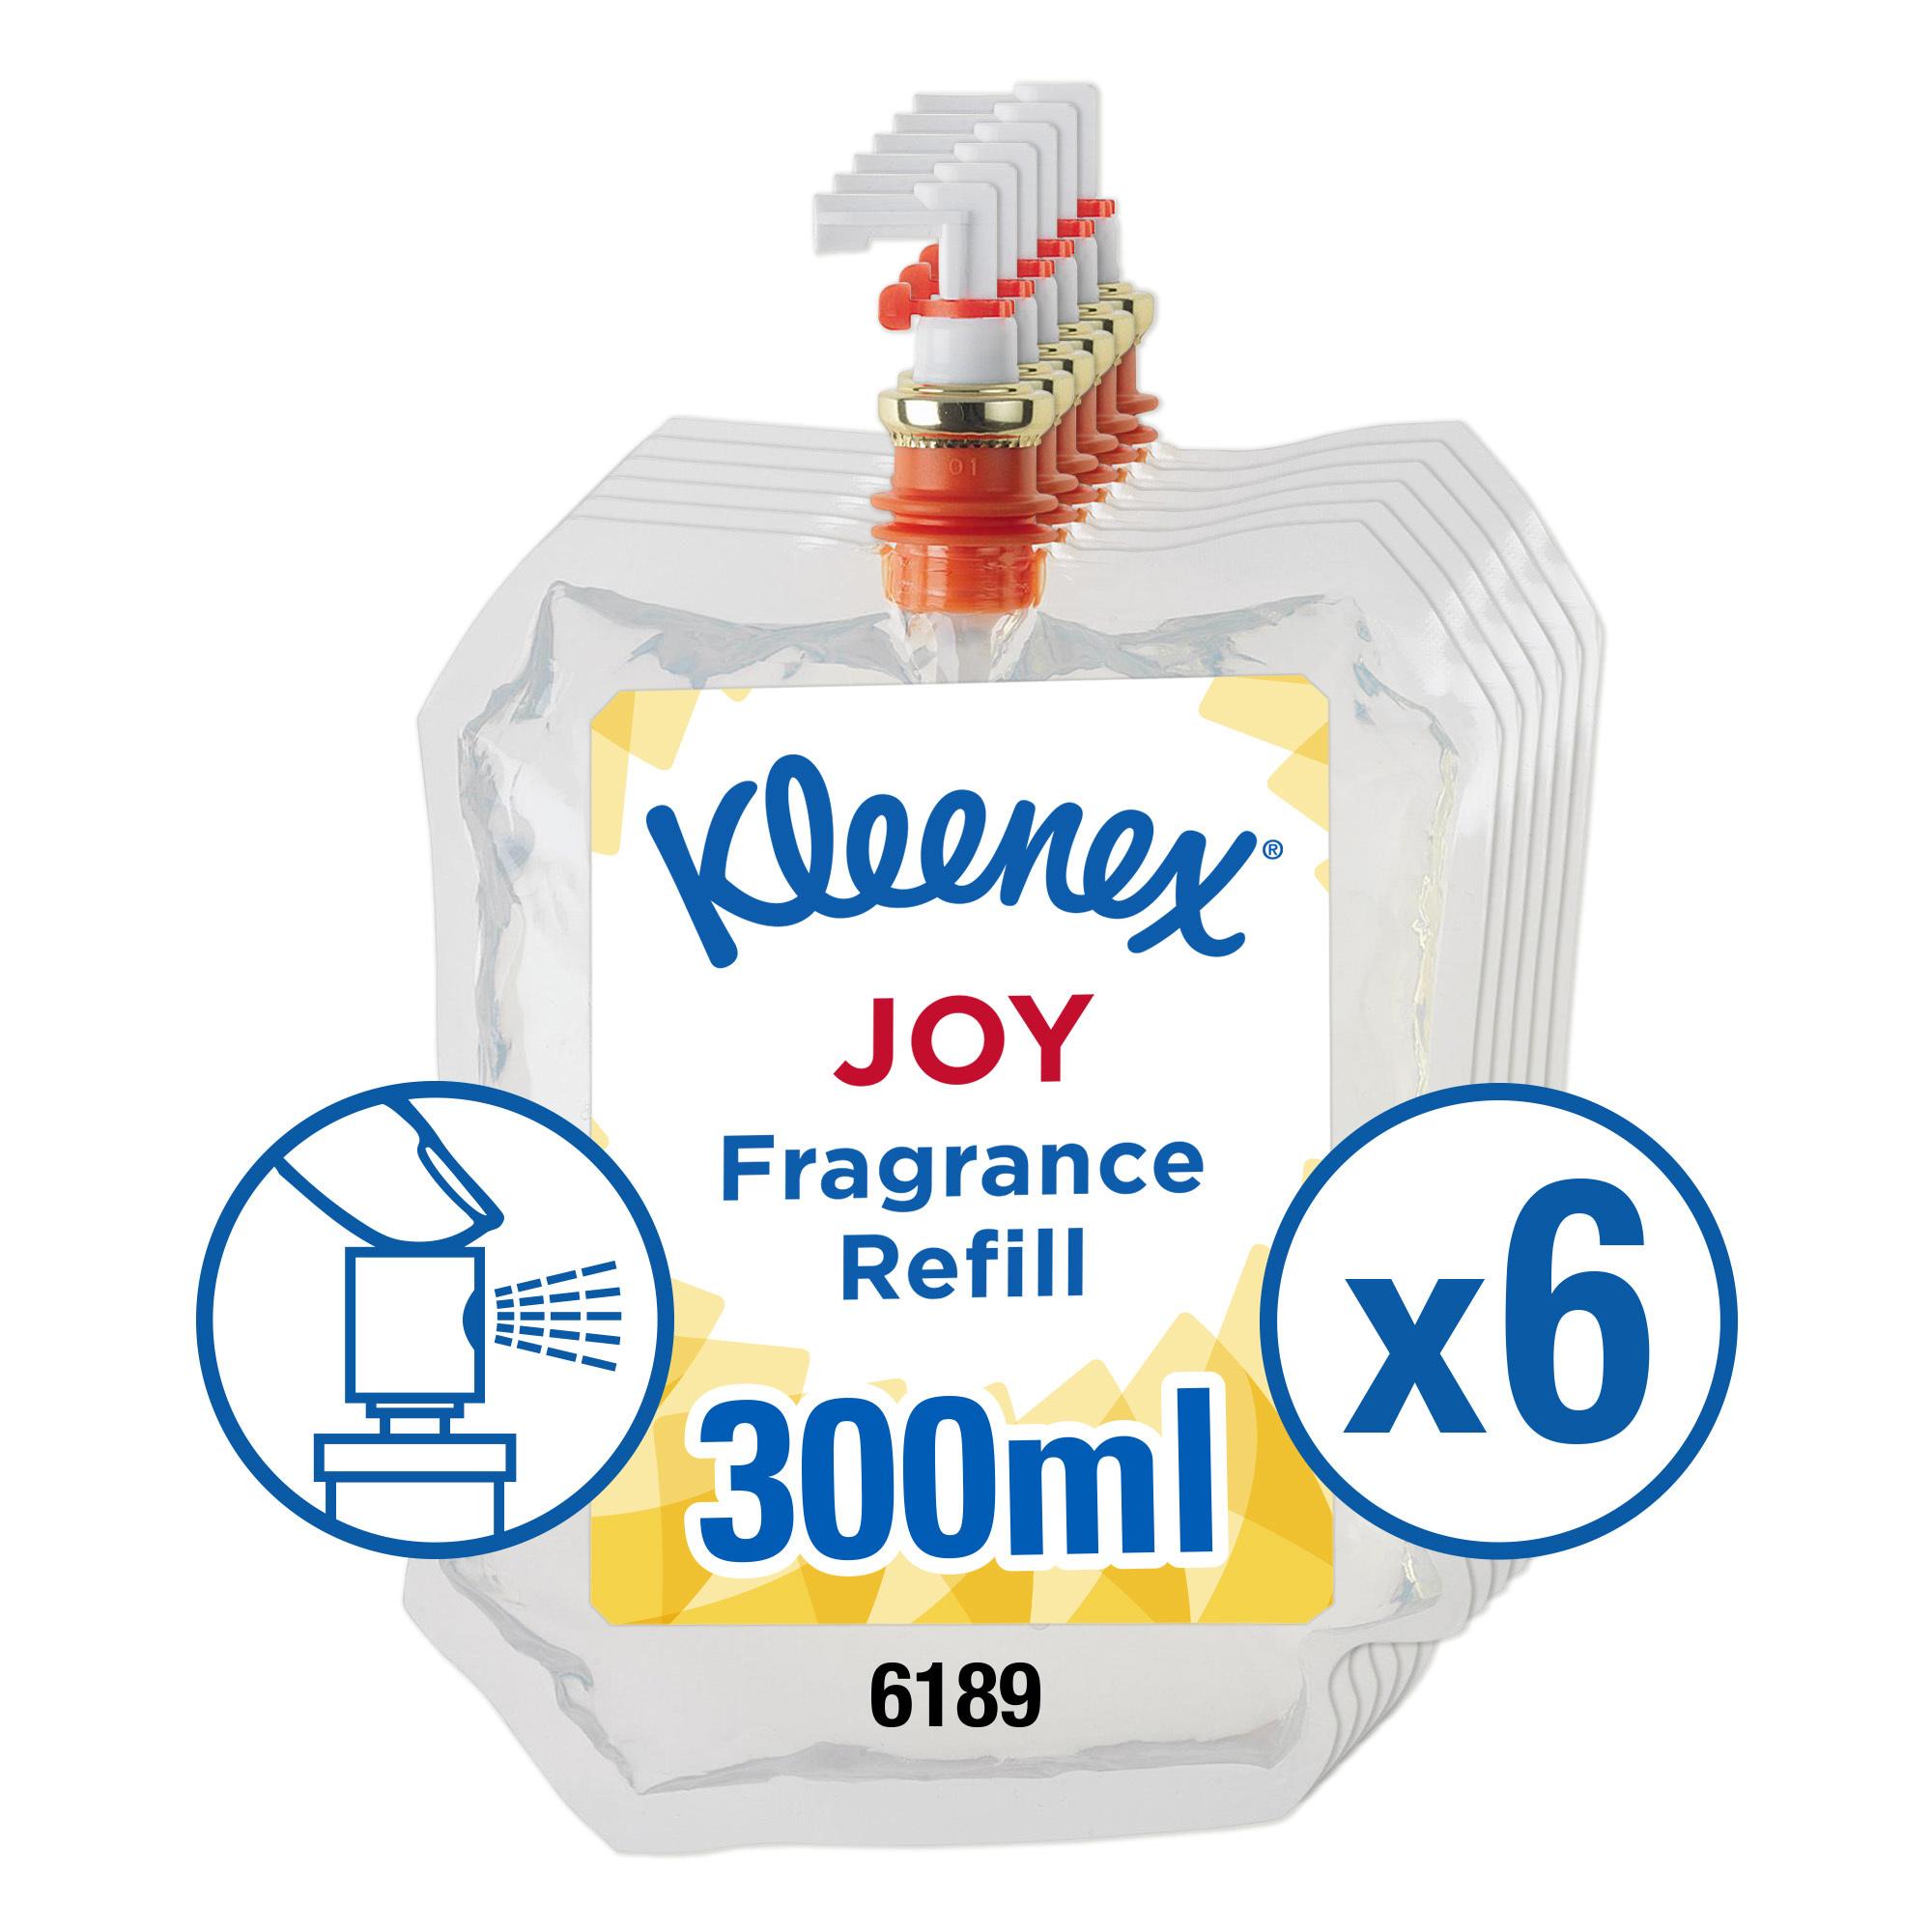 Air freshener Kleenex Botanics Botanics Aircare Joy Refill 300ml Ref 6189 Pack 6